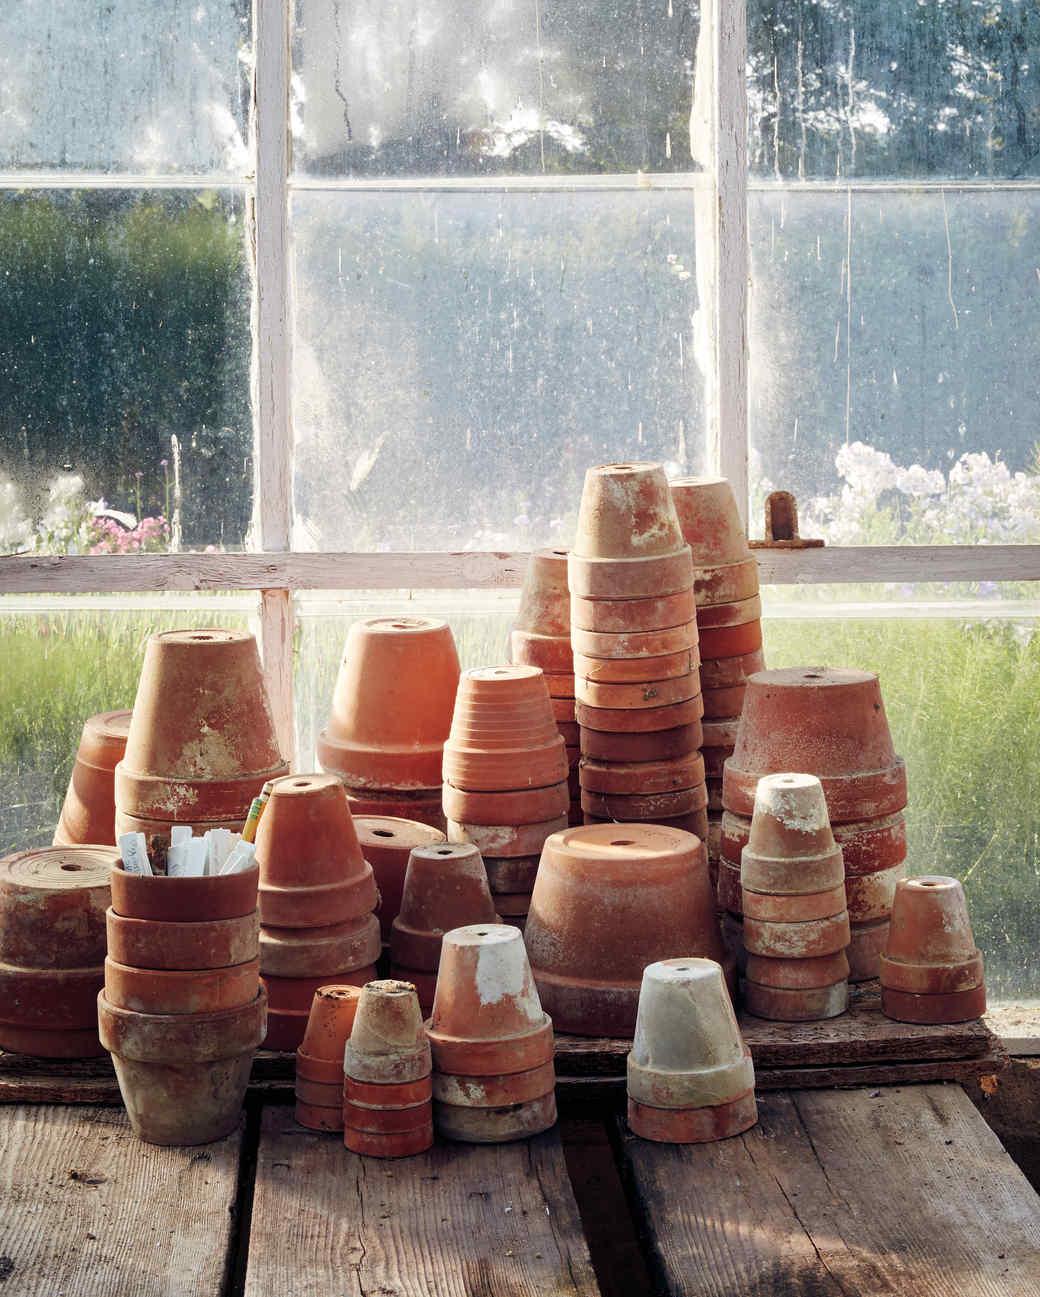 meadowburn-farm-greenhouse-150-d111449.jpg